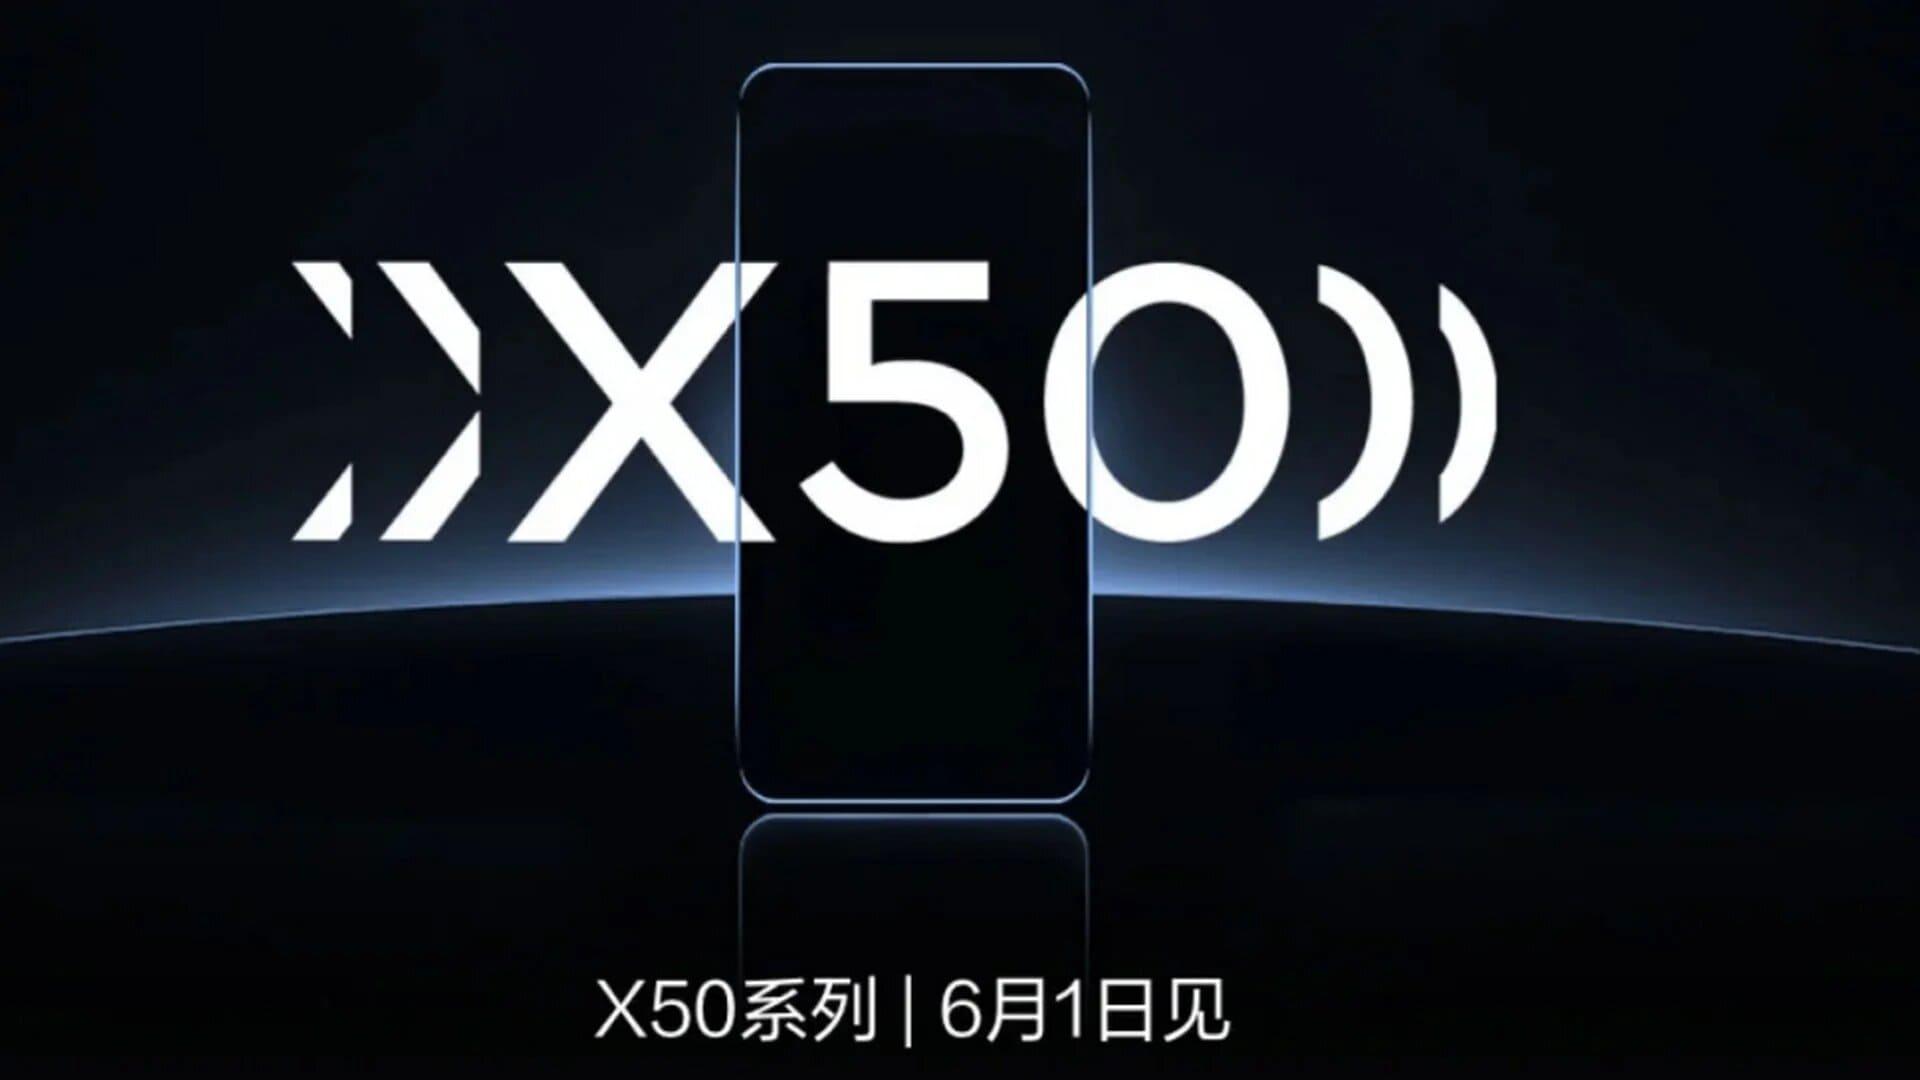 vivo-x50-5g-cartel-filtrado